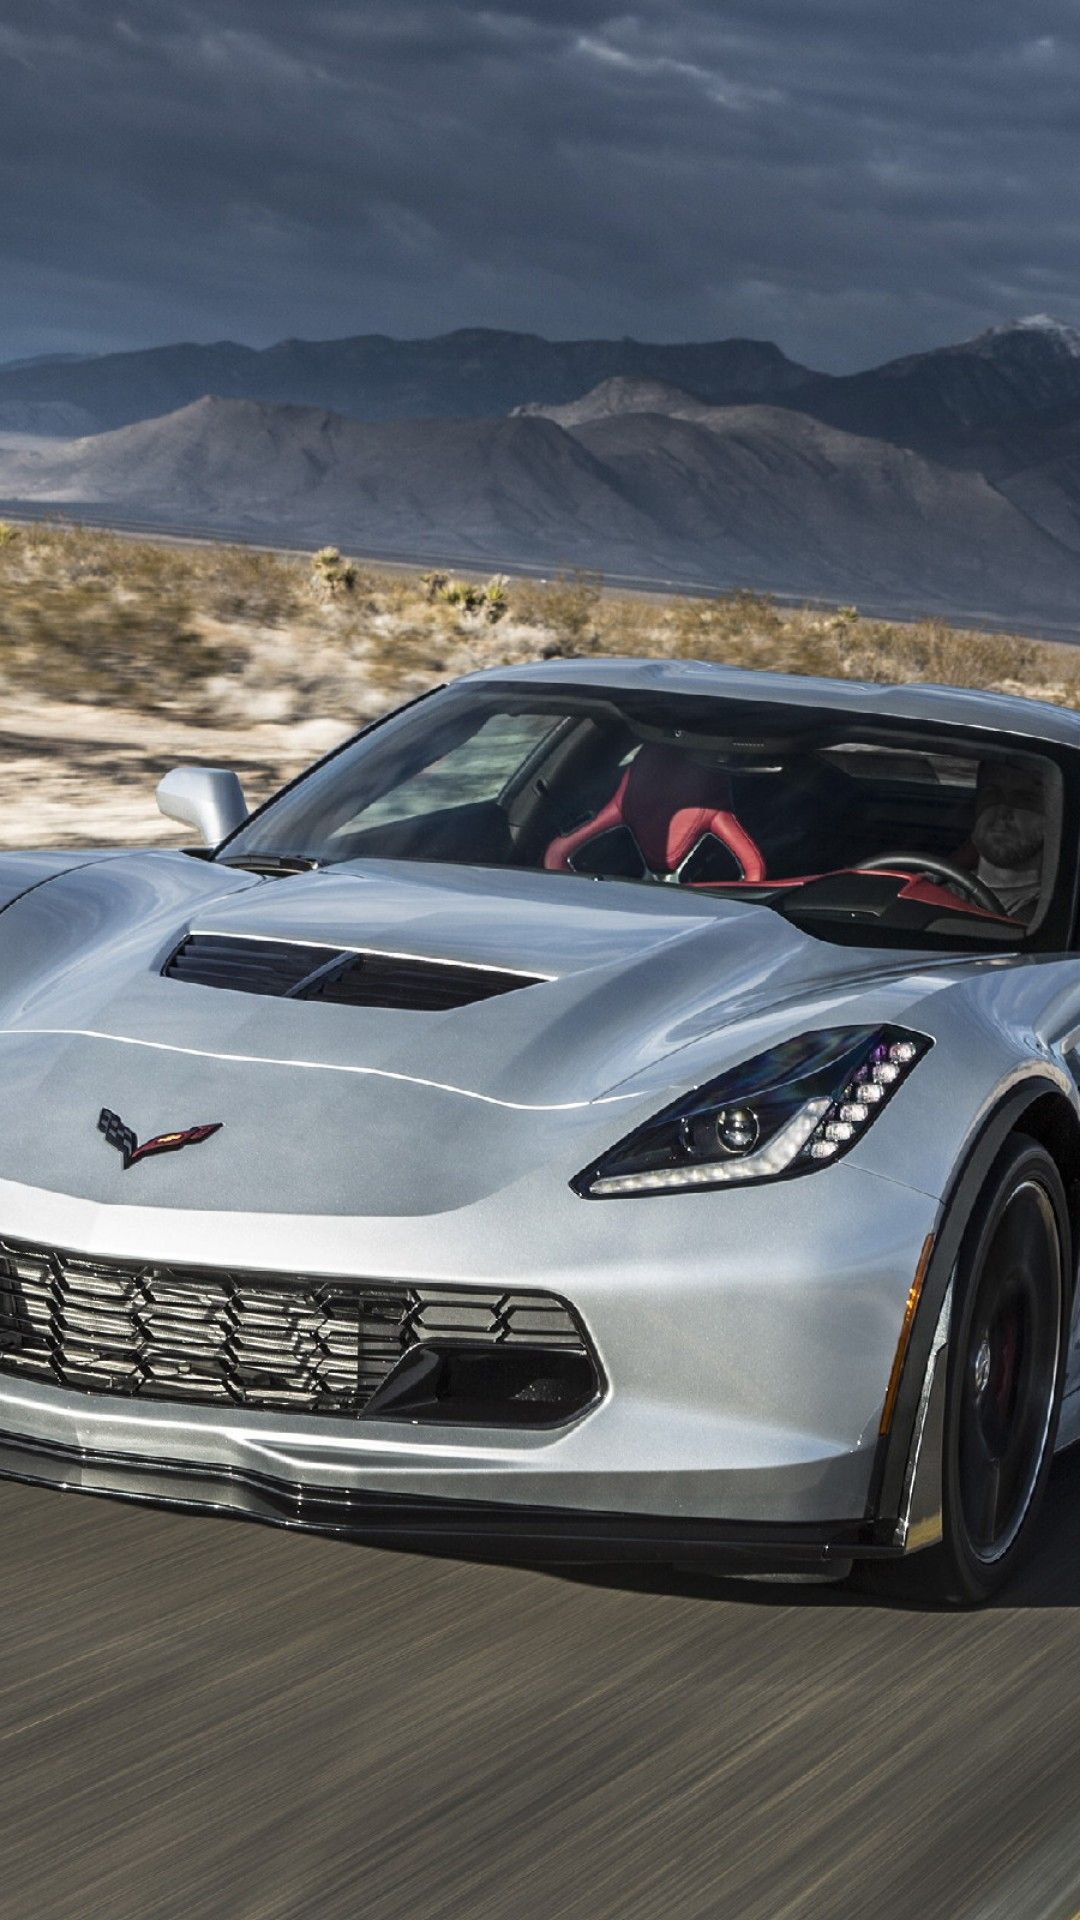 Corvette phone wallpapers top free corvette phone - Corvette wallpaper ...